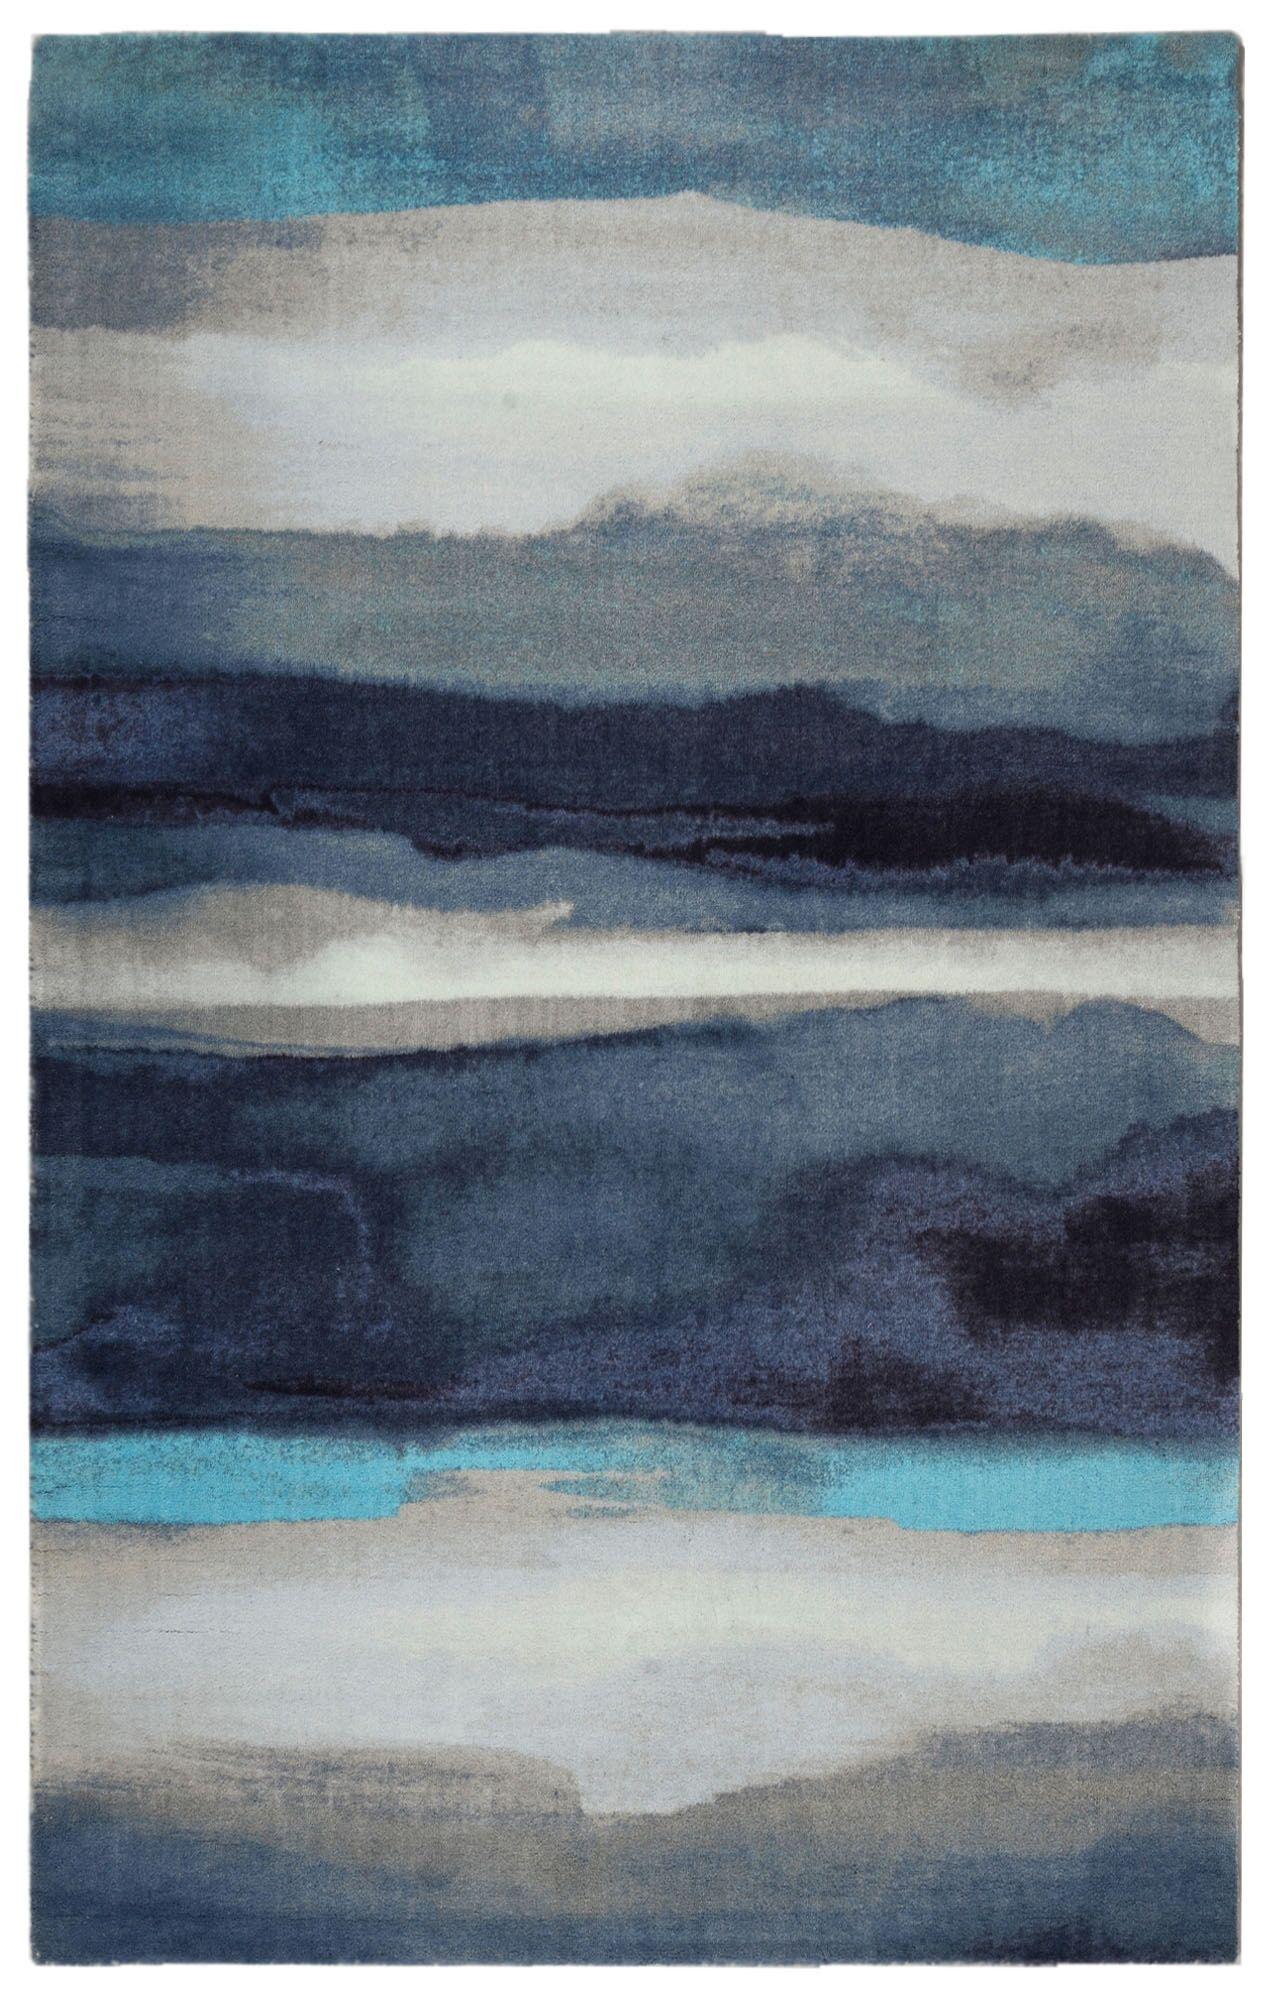 Labombard Canvas Contemporary Modern Blue/Gray Area Rug Rug Size: Rectangle 7'6